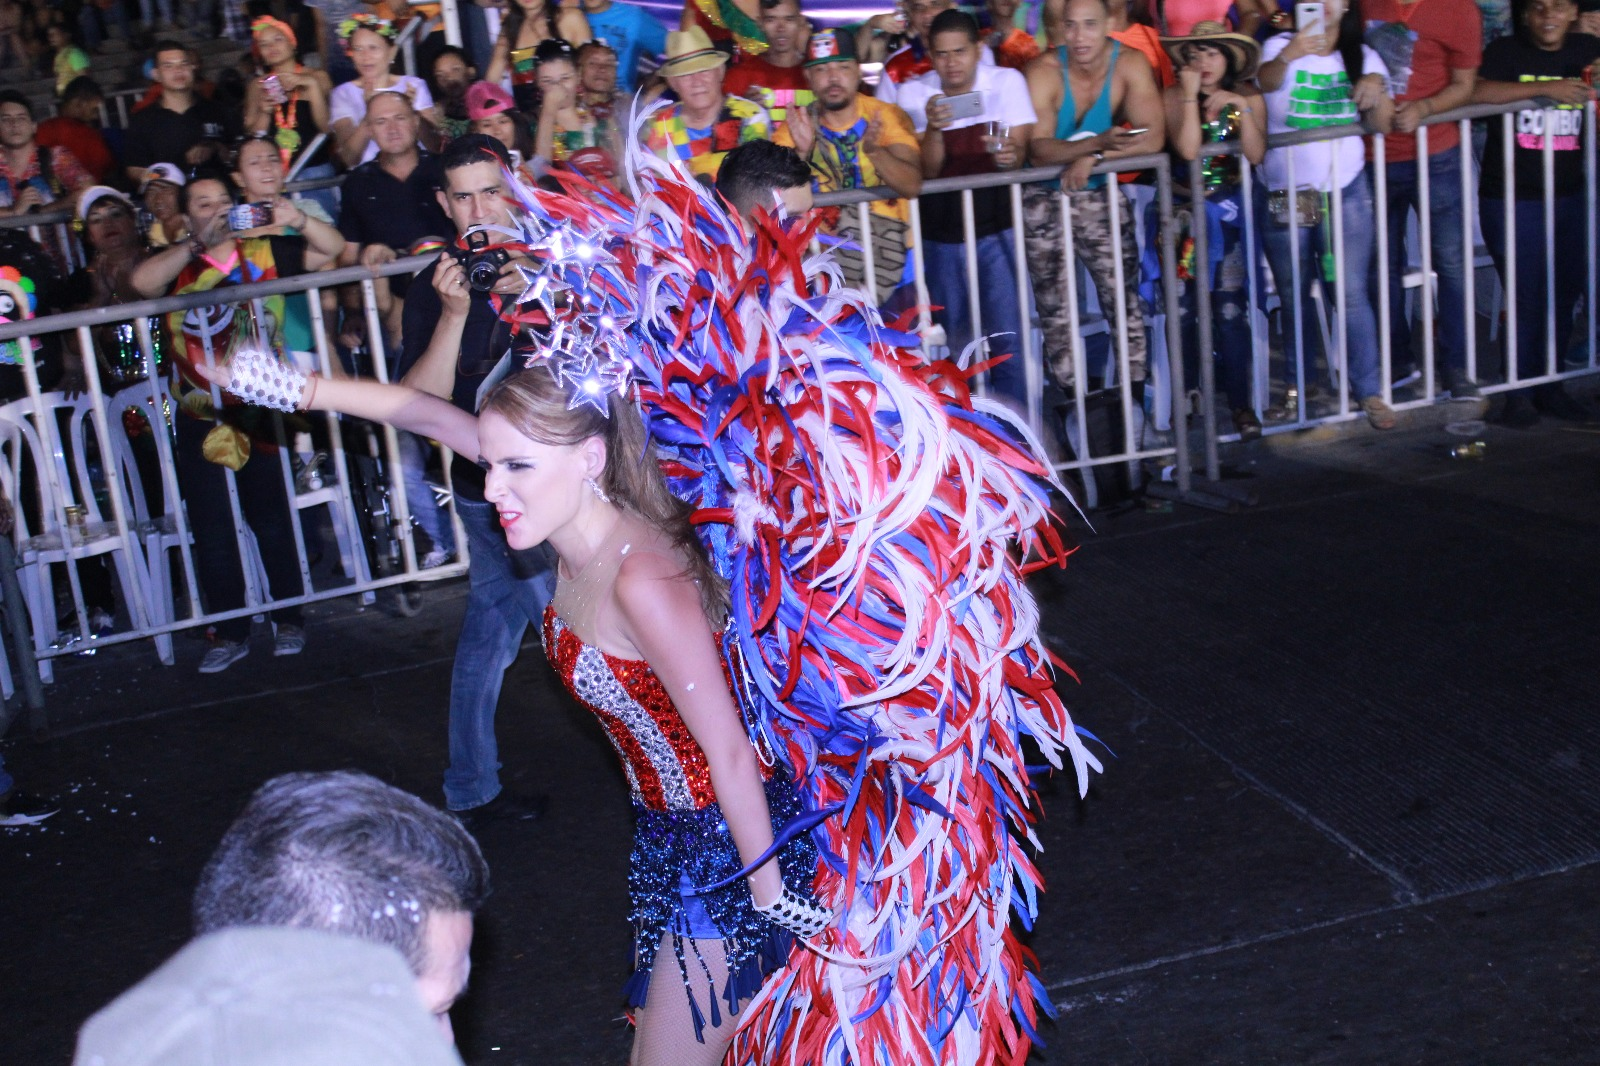 Fefi Mendoza, Reina del Carnaval /Foto FarfreyFashion